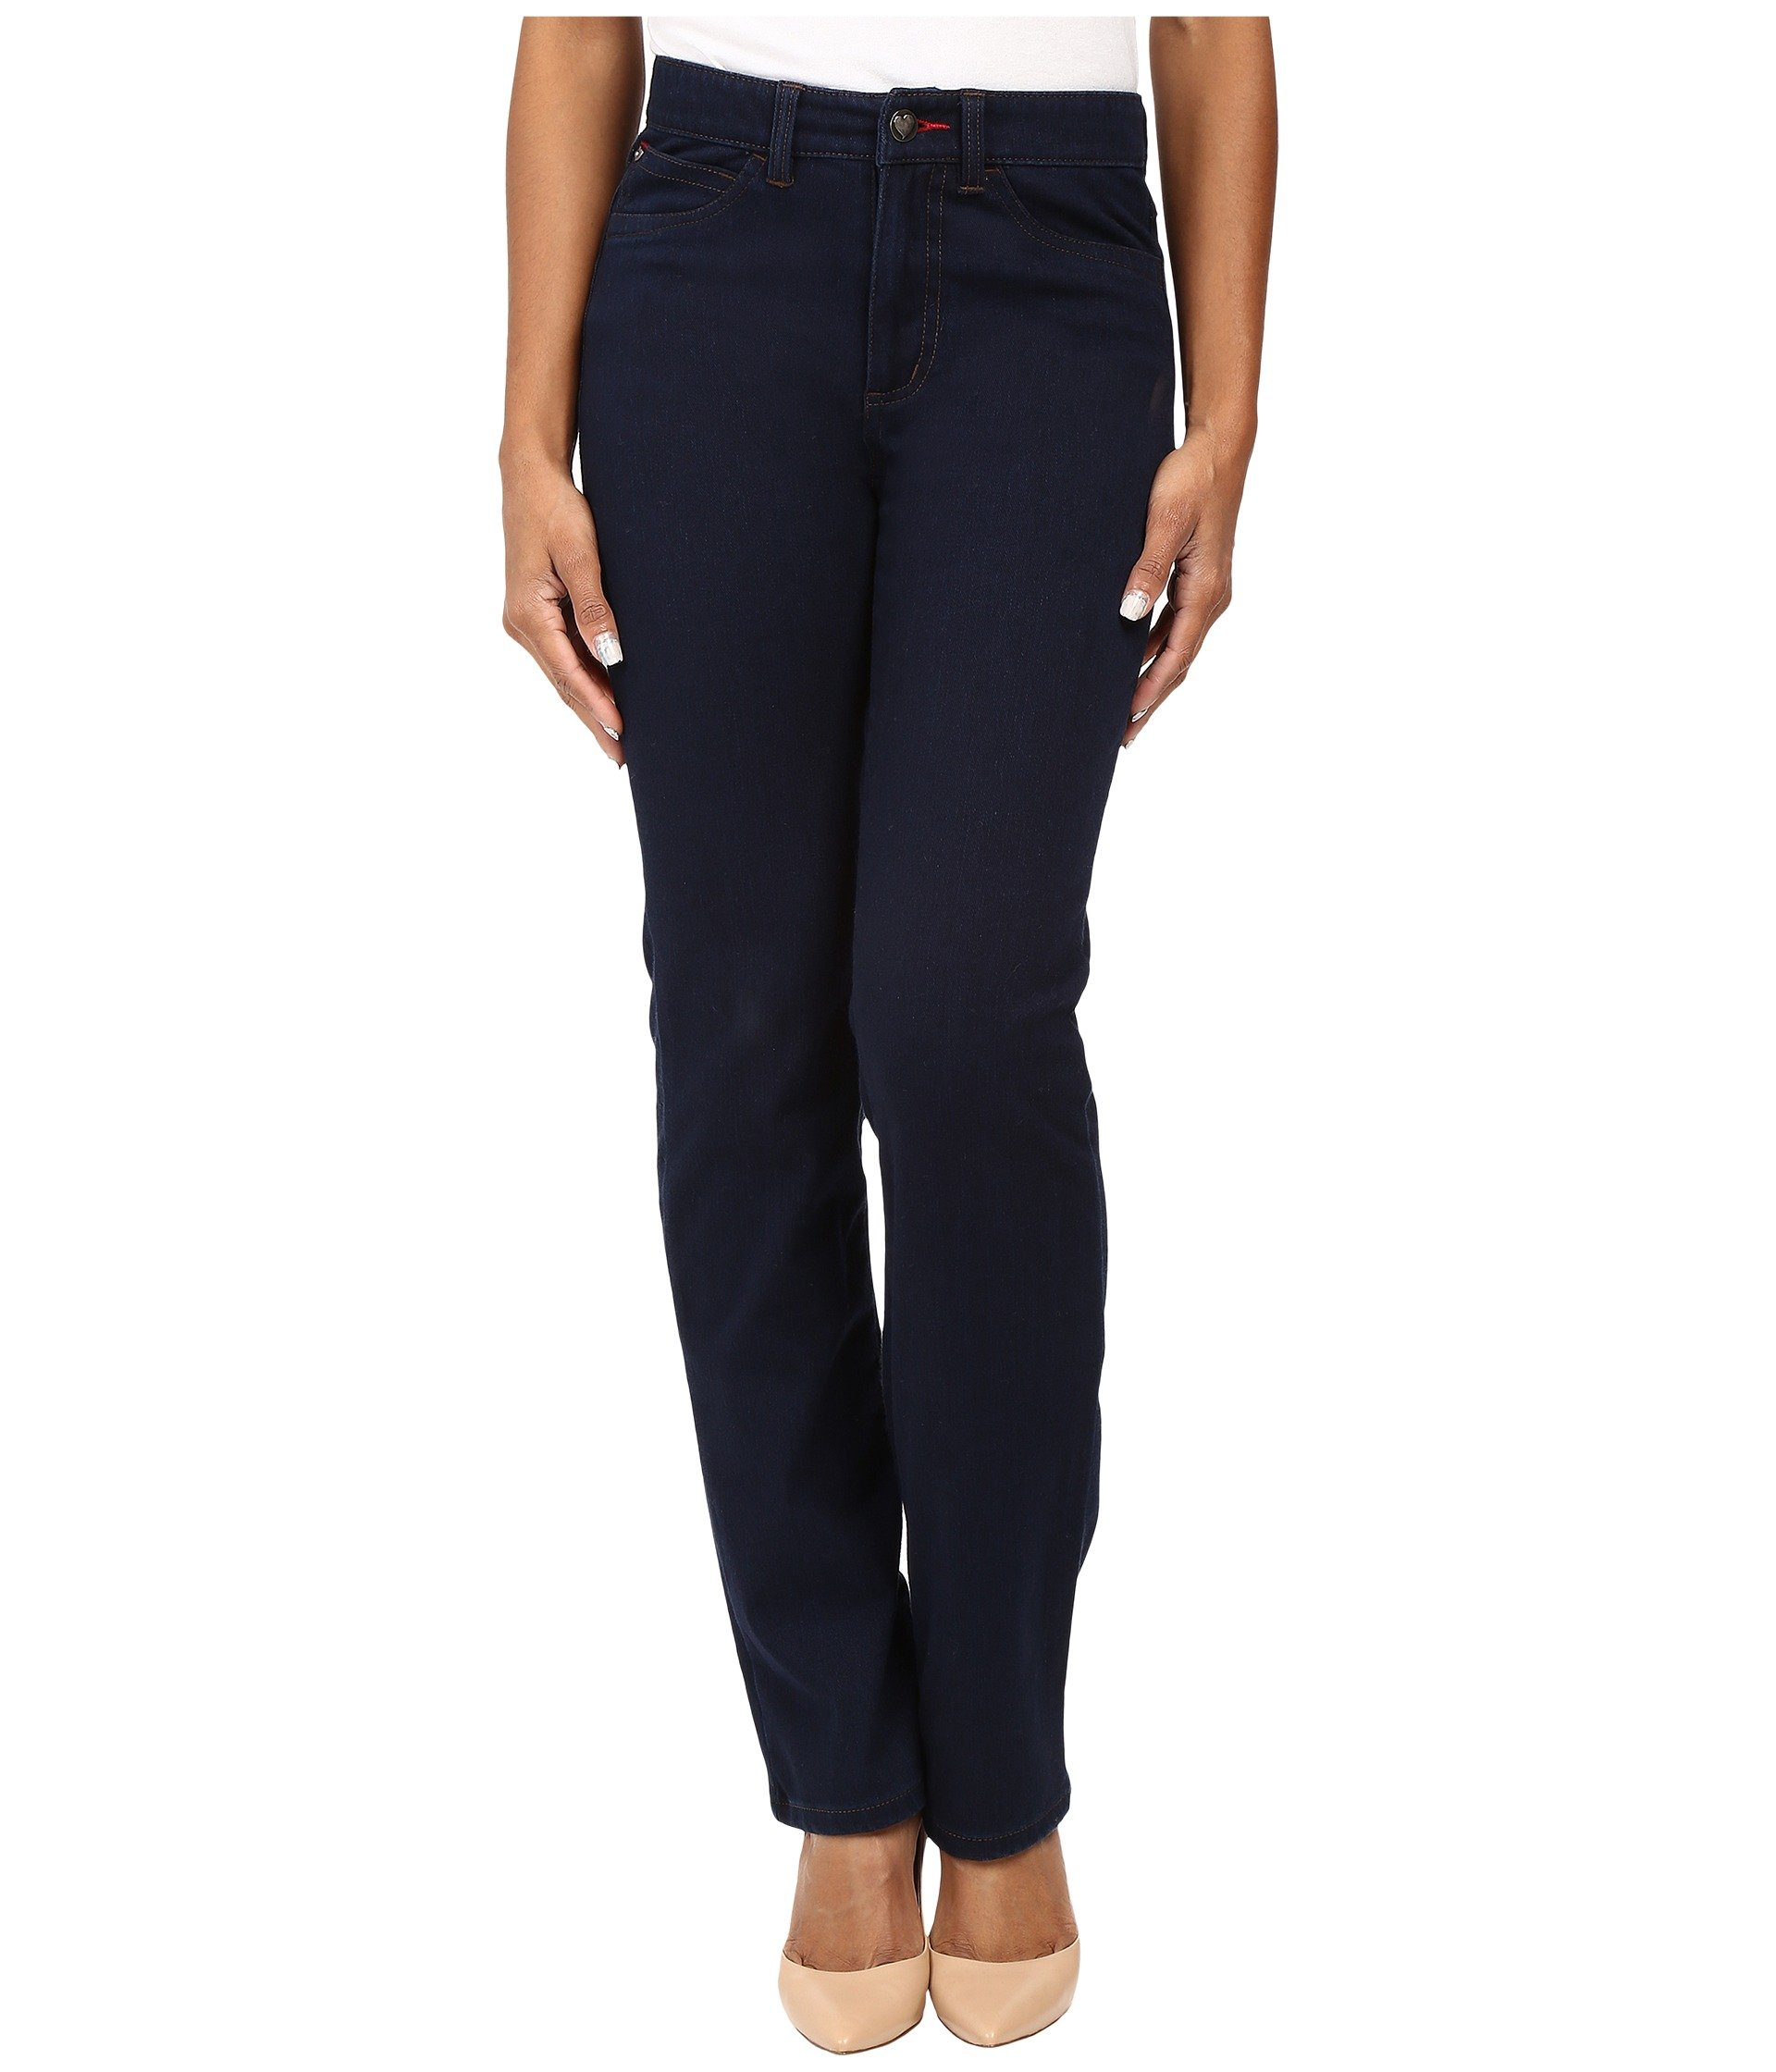 FDJ French Dressing Jeans Women's Petite Suzanne Straight Leg Love Denim in Indigo Indigo Jeans